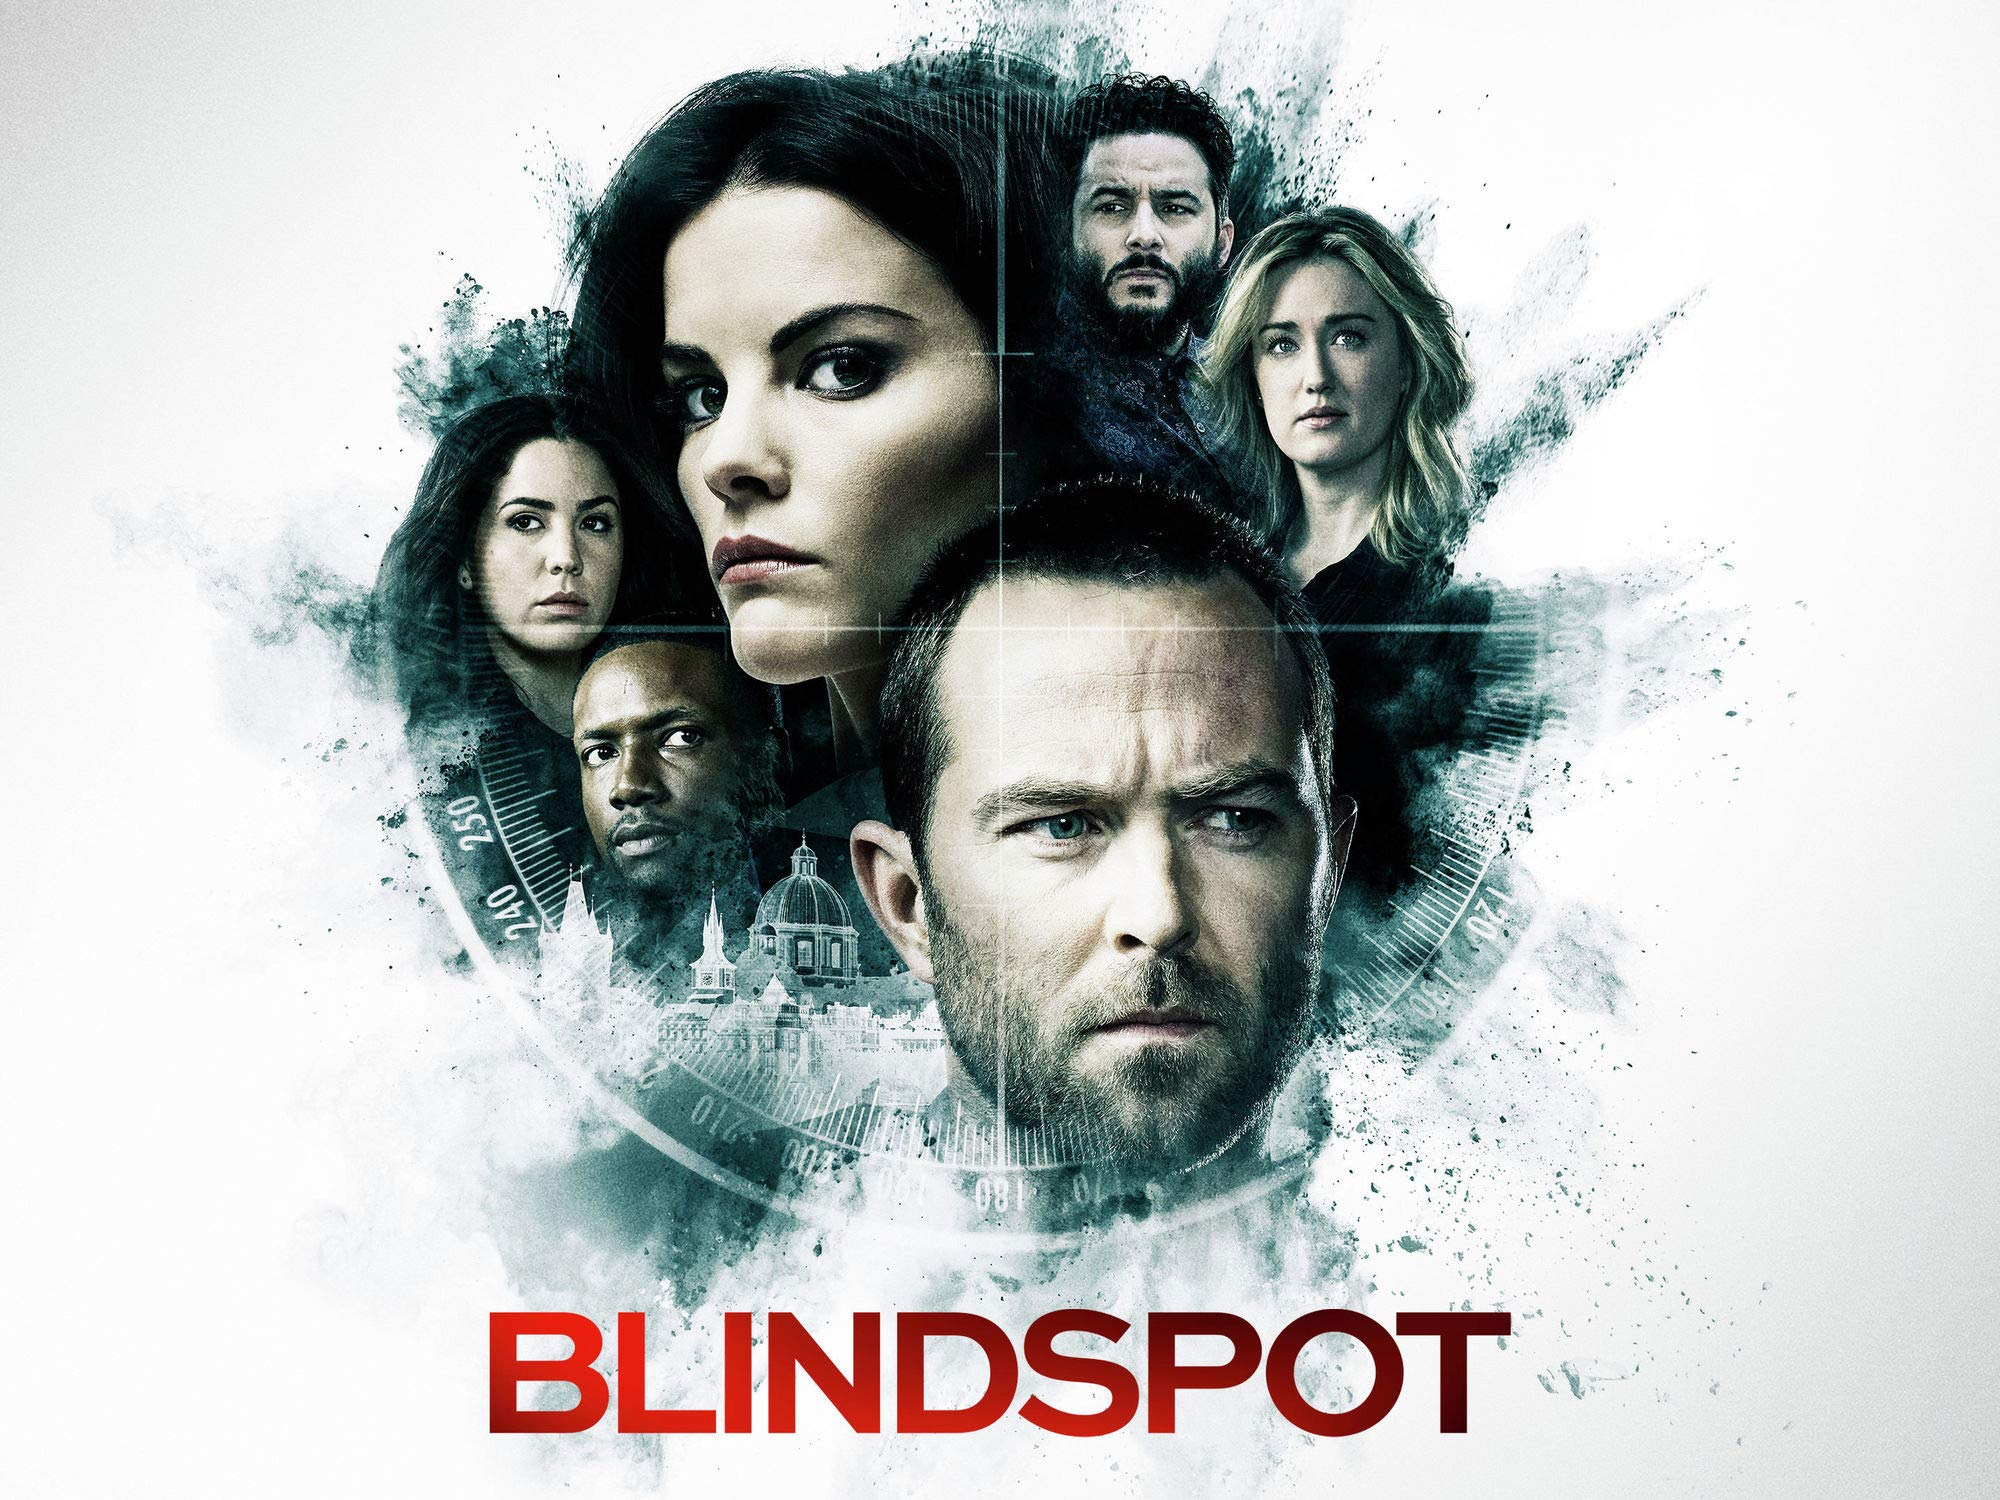 blindspot season 2 episode 13 watch online free